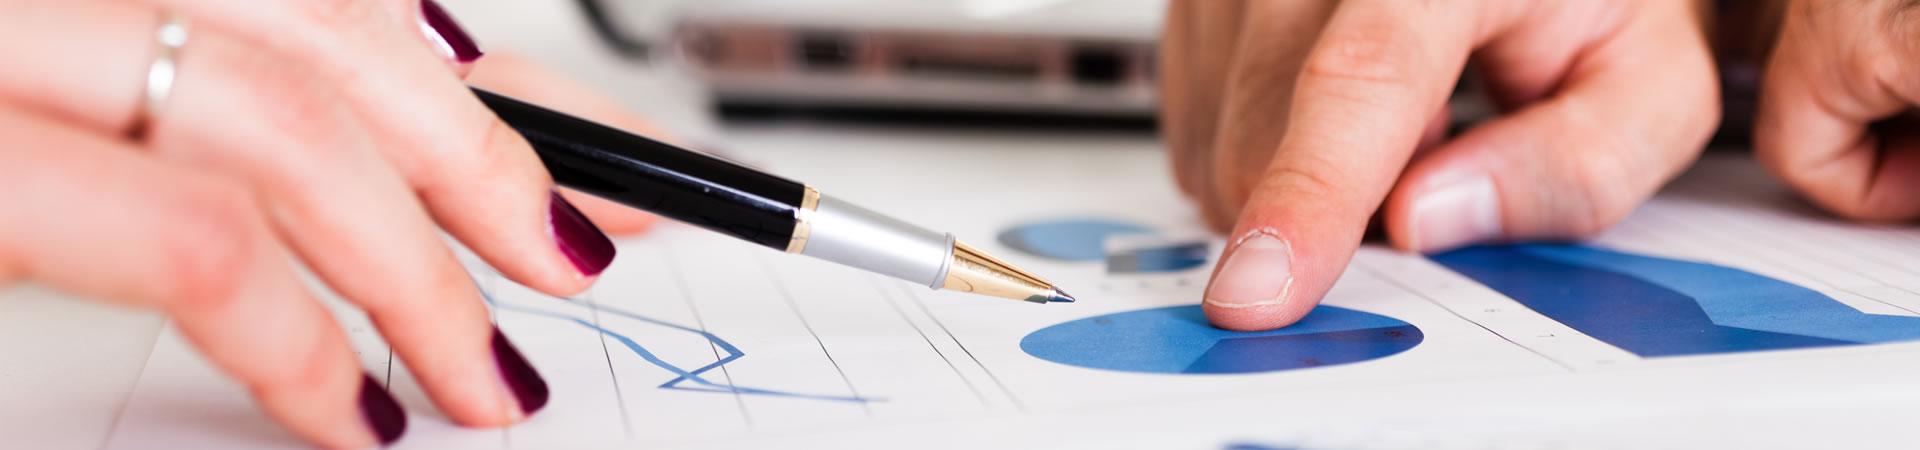 Majors Accountants in Hull Contact Header